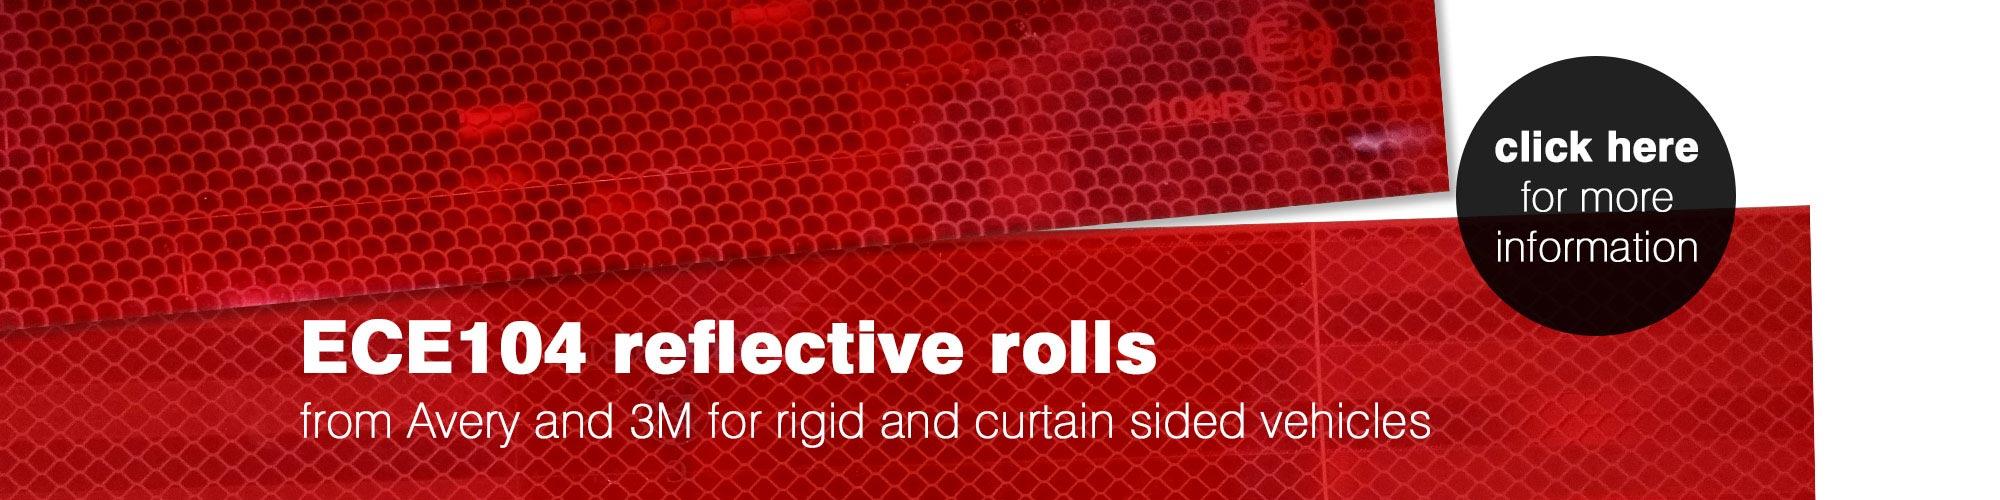 Victory Design - ECE 104 Reflective Rolls